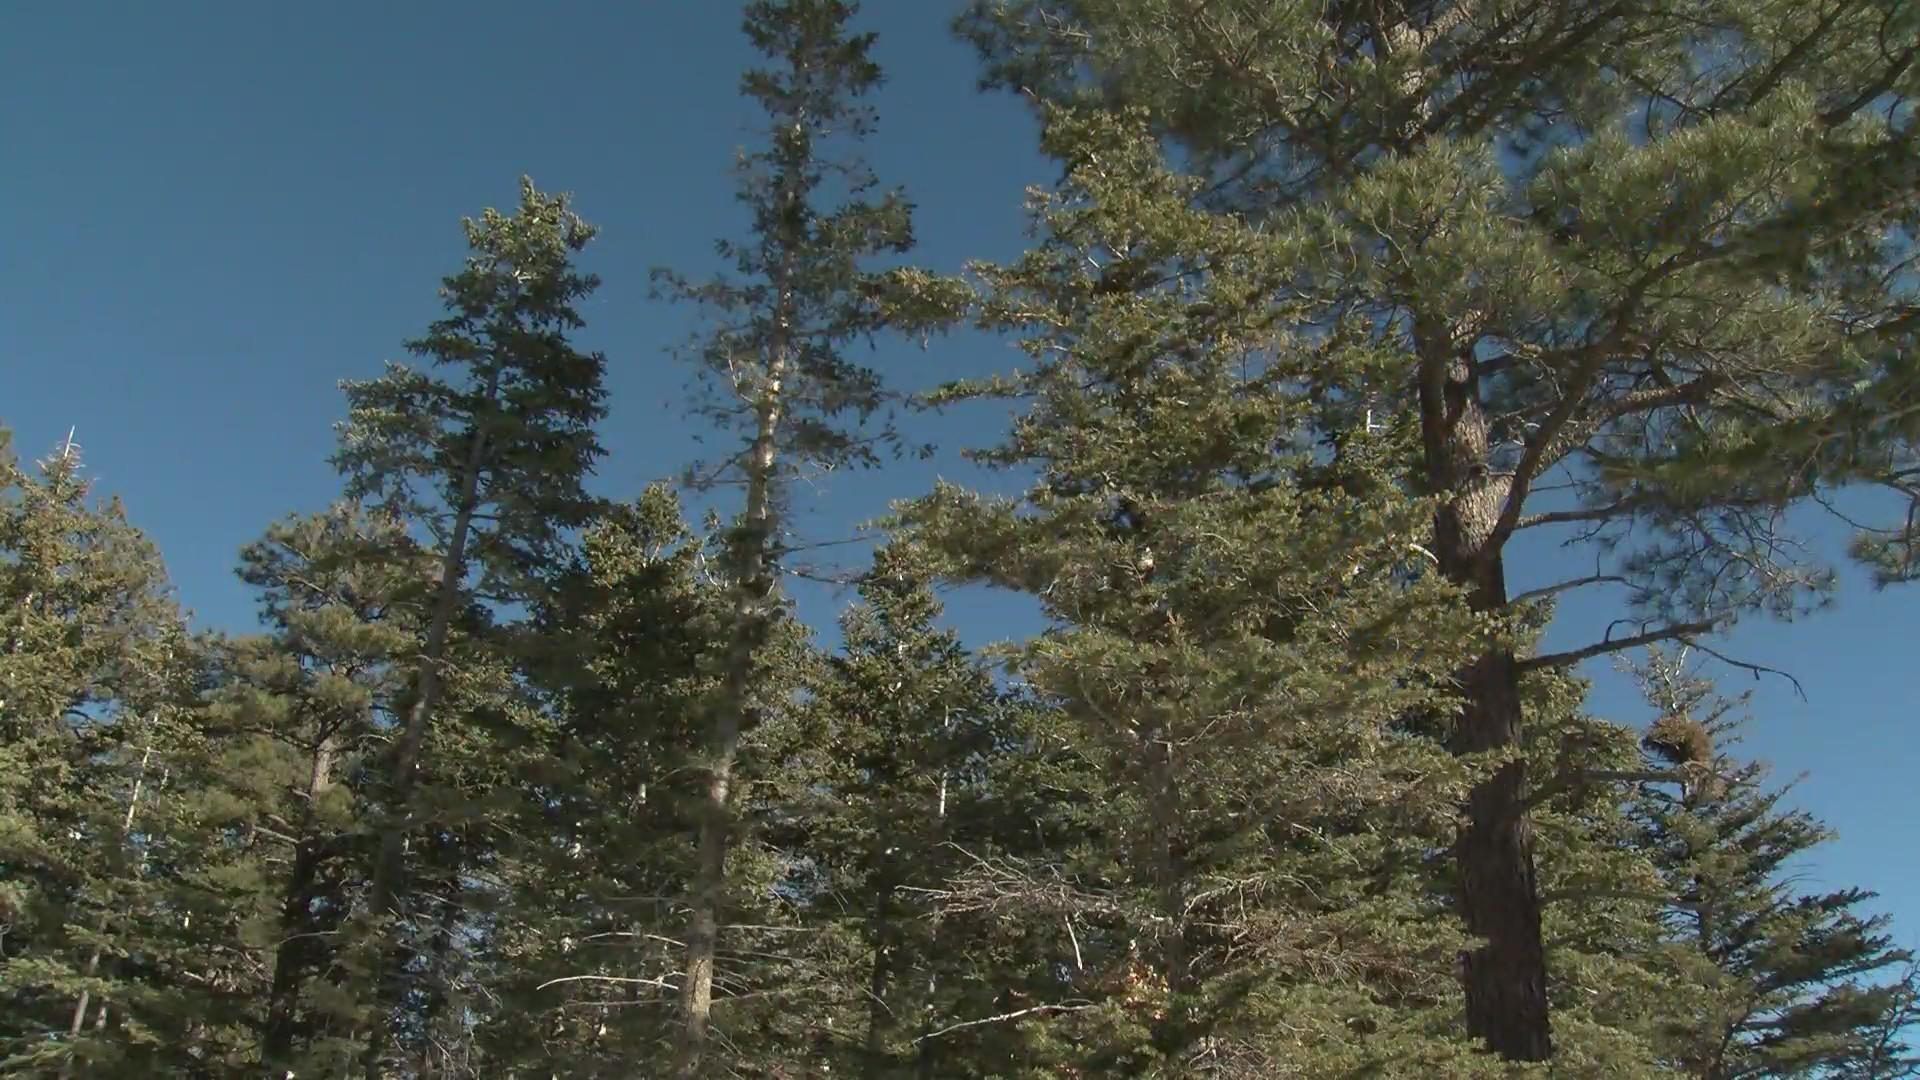 Christmas Tree Permits 2020 Washington State Gila National Forest to offer Christmas tree permits online | KRQE